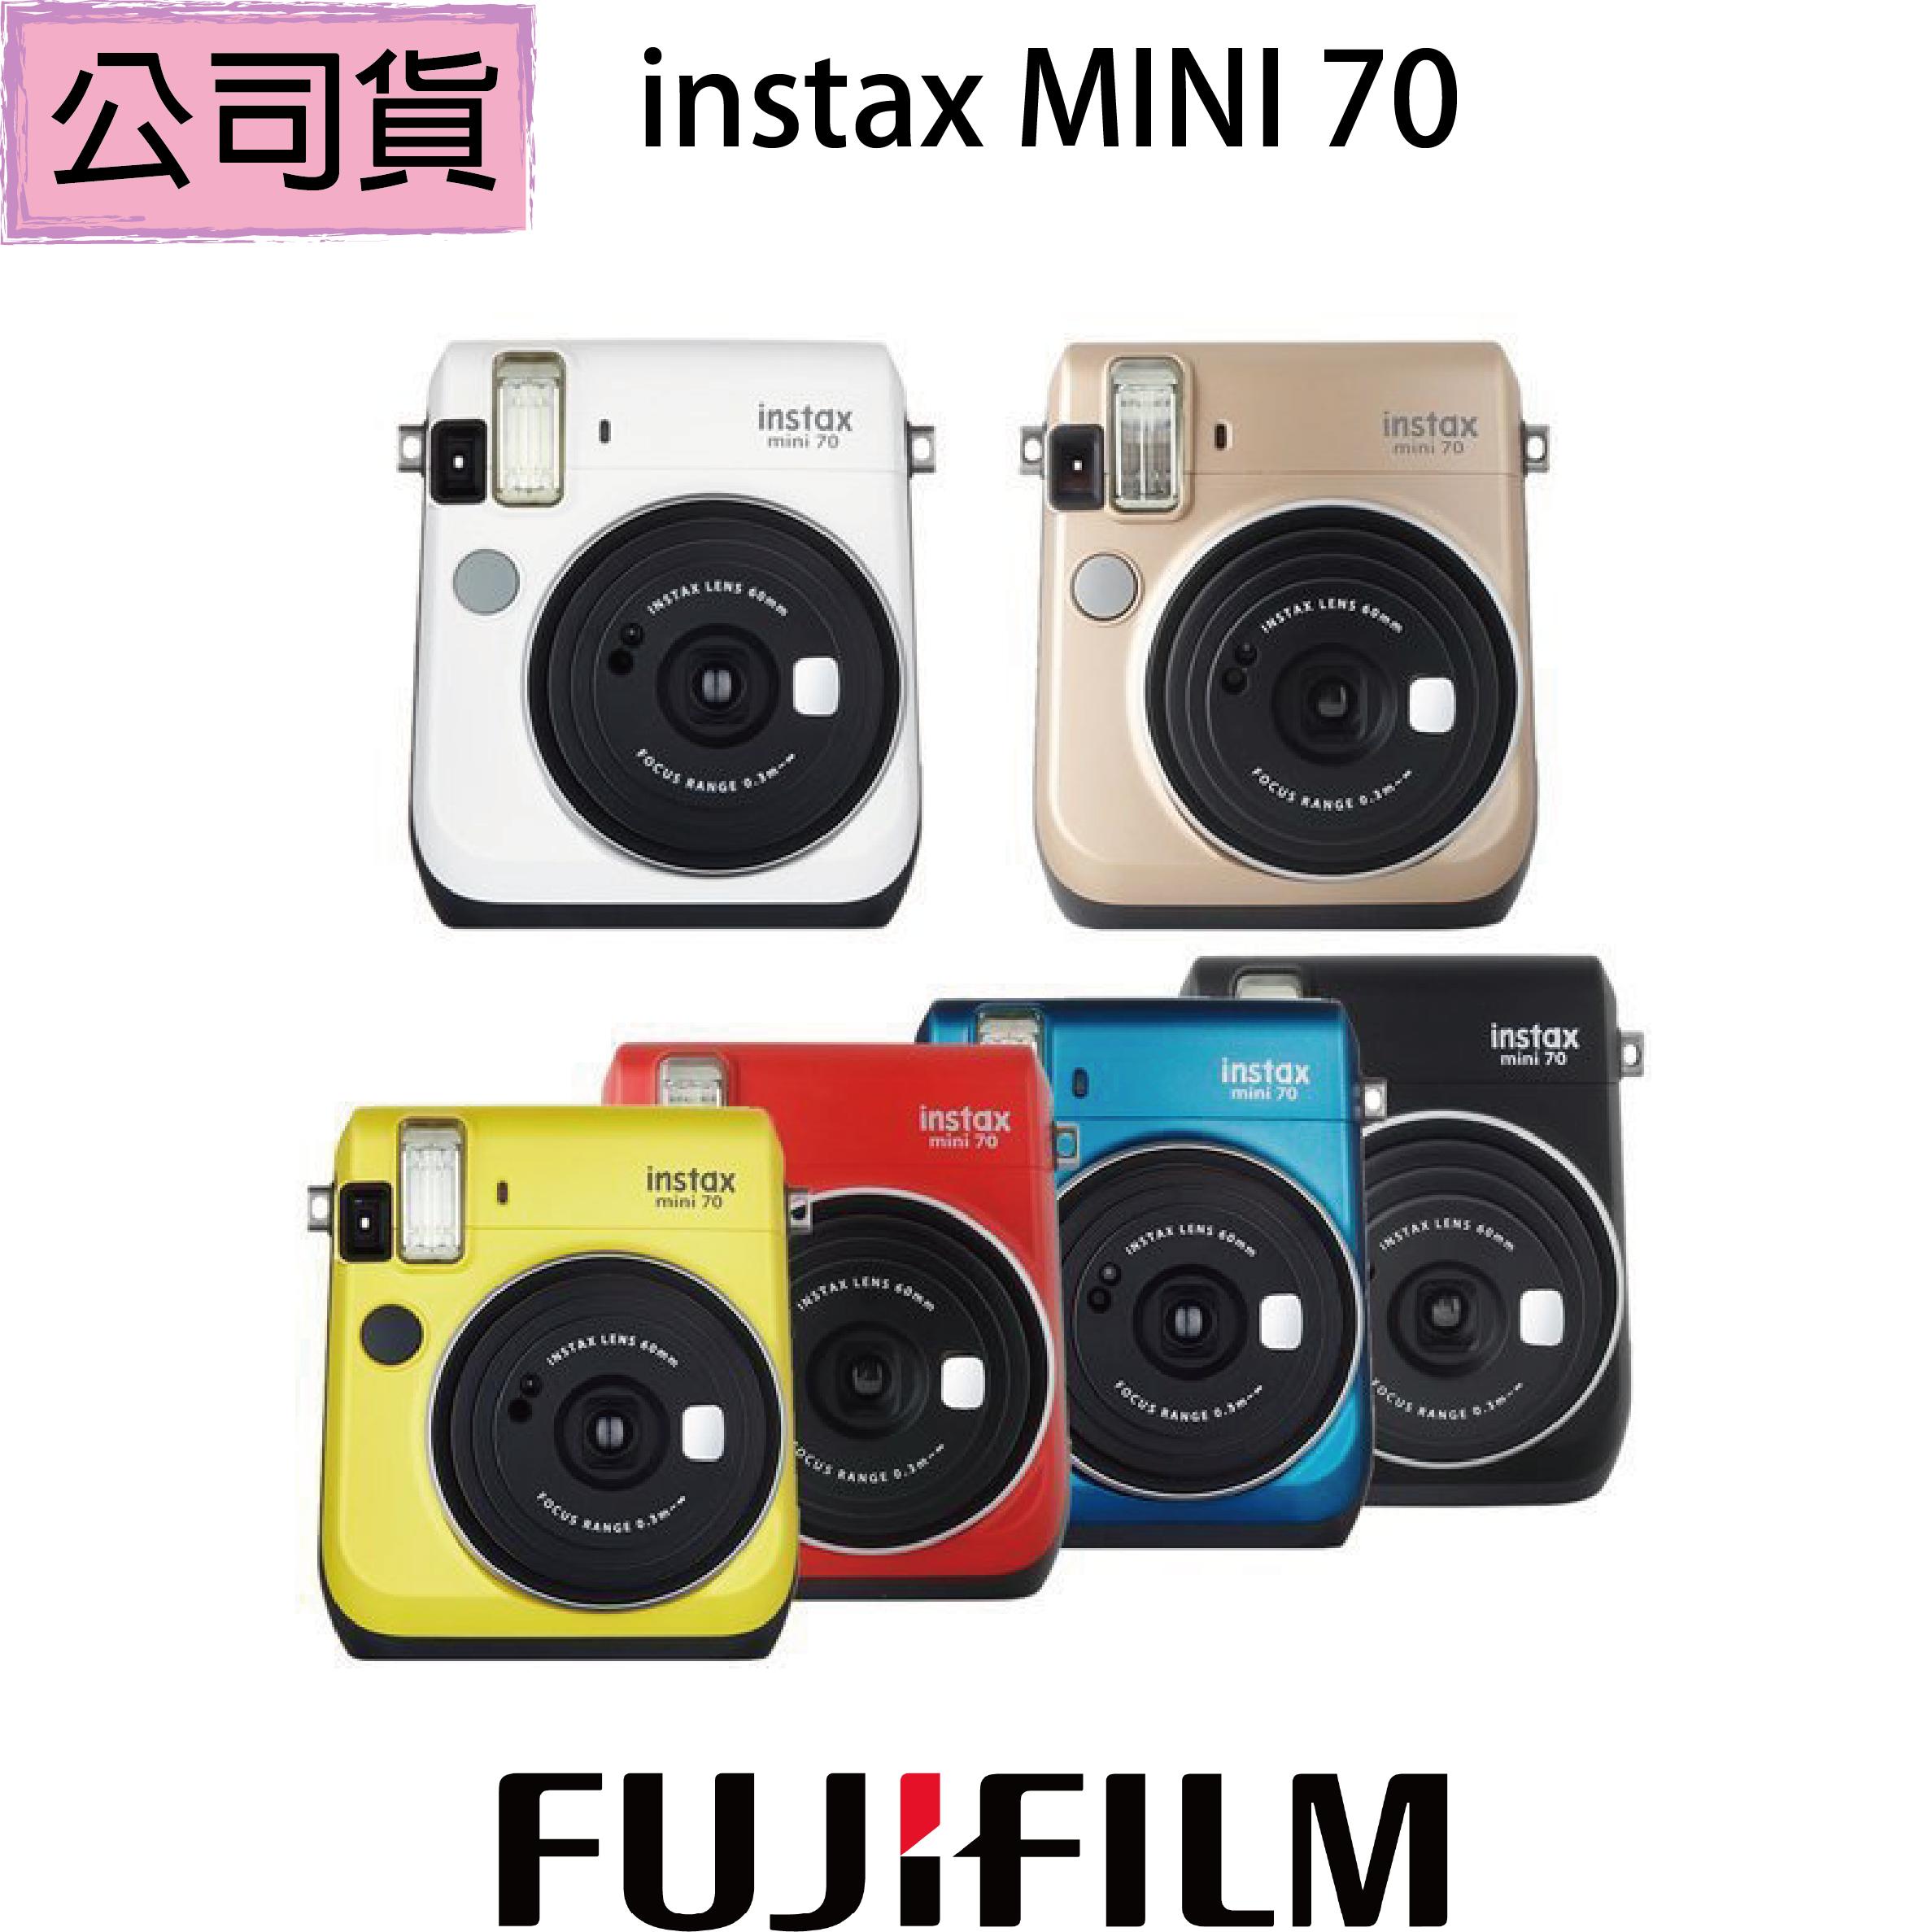 【CR2充電超值組】【FUJIFILM】instax mini 70 拍立得相機(公司貨)